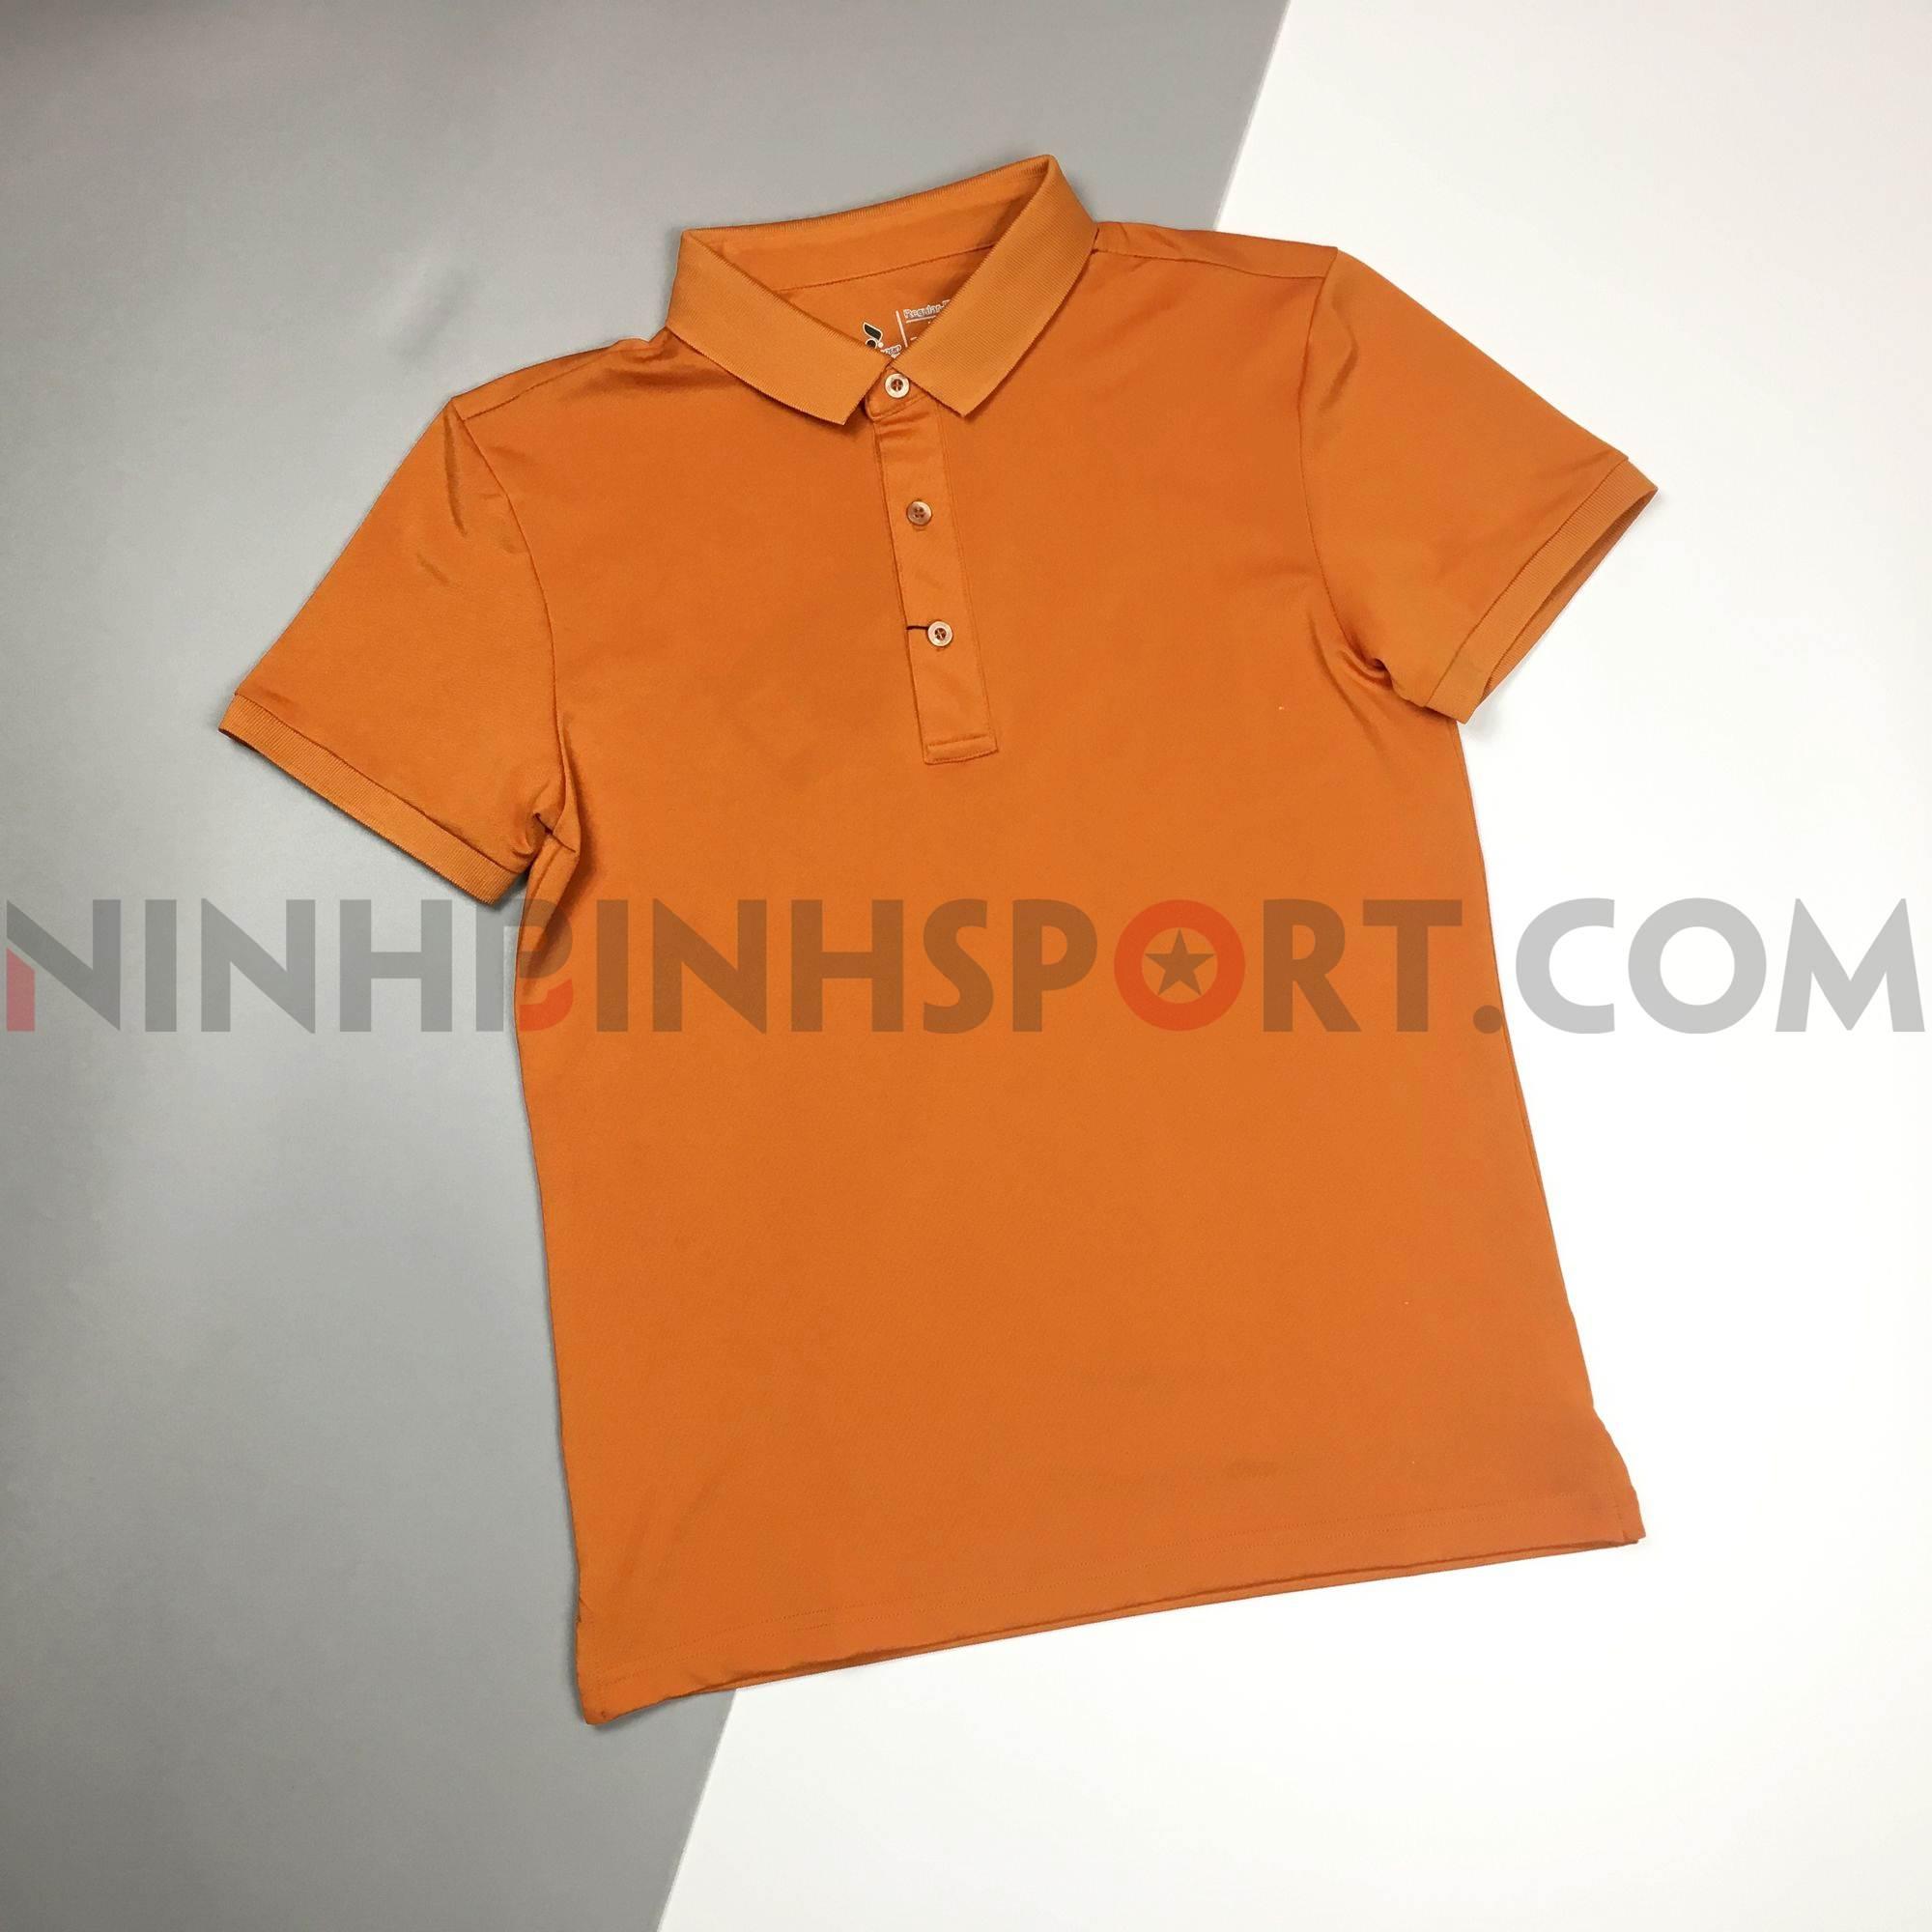 Áo thể thao nam Donex Golf Polo MC-9004-20-08